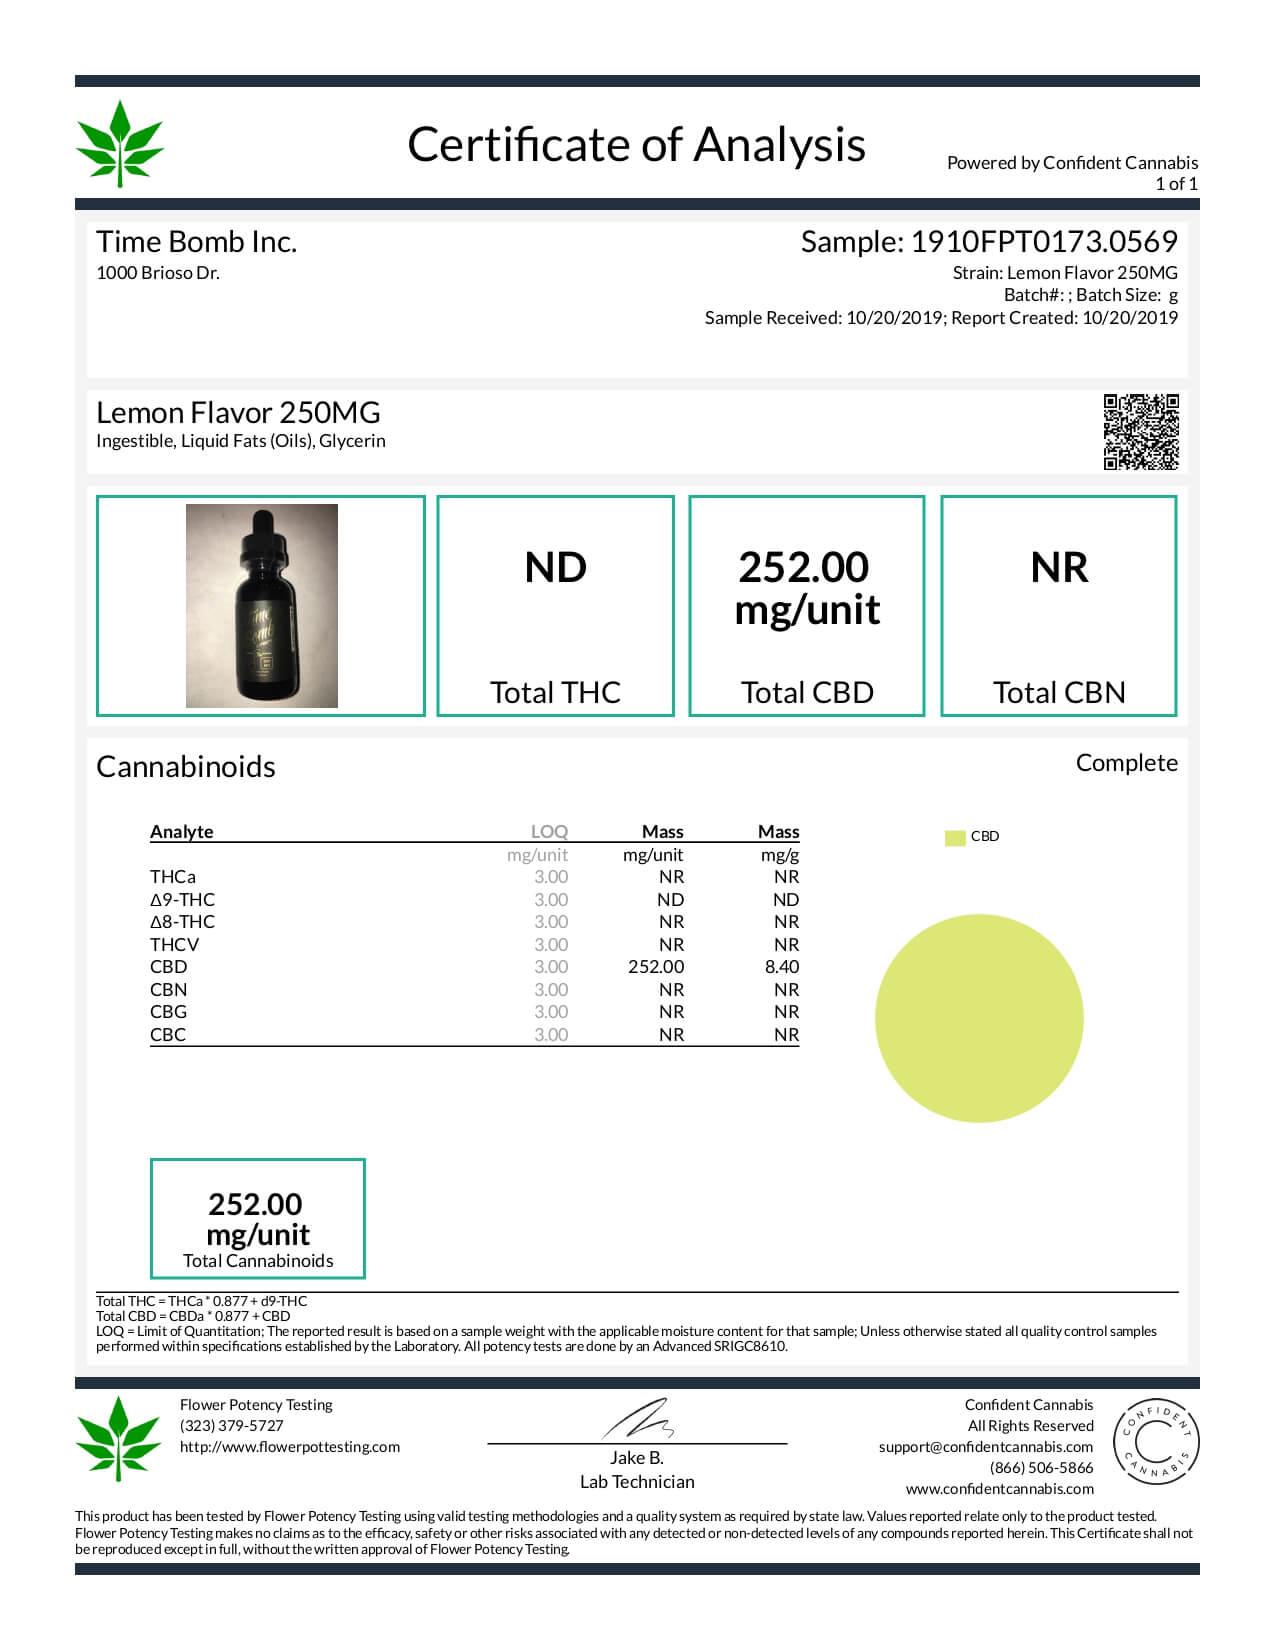 Time Bomb Extracts CBD Tincture Lemon 250mg Lab Report